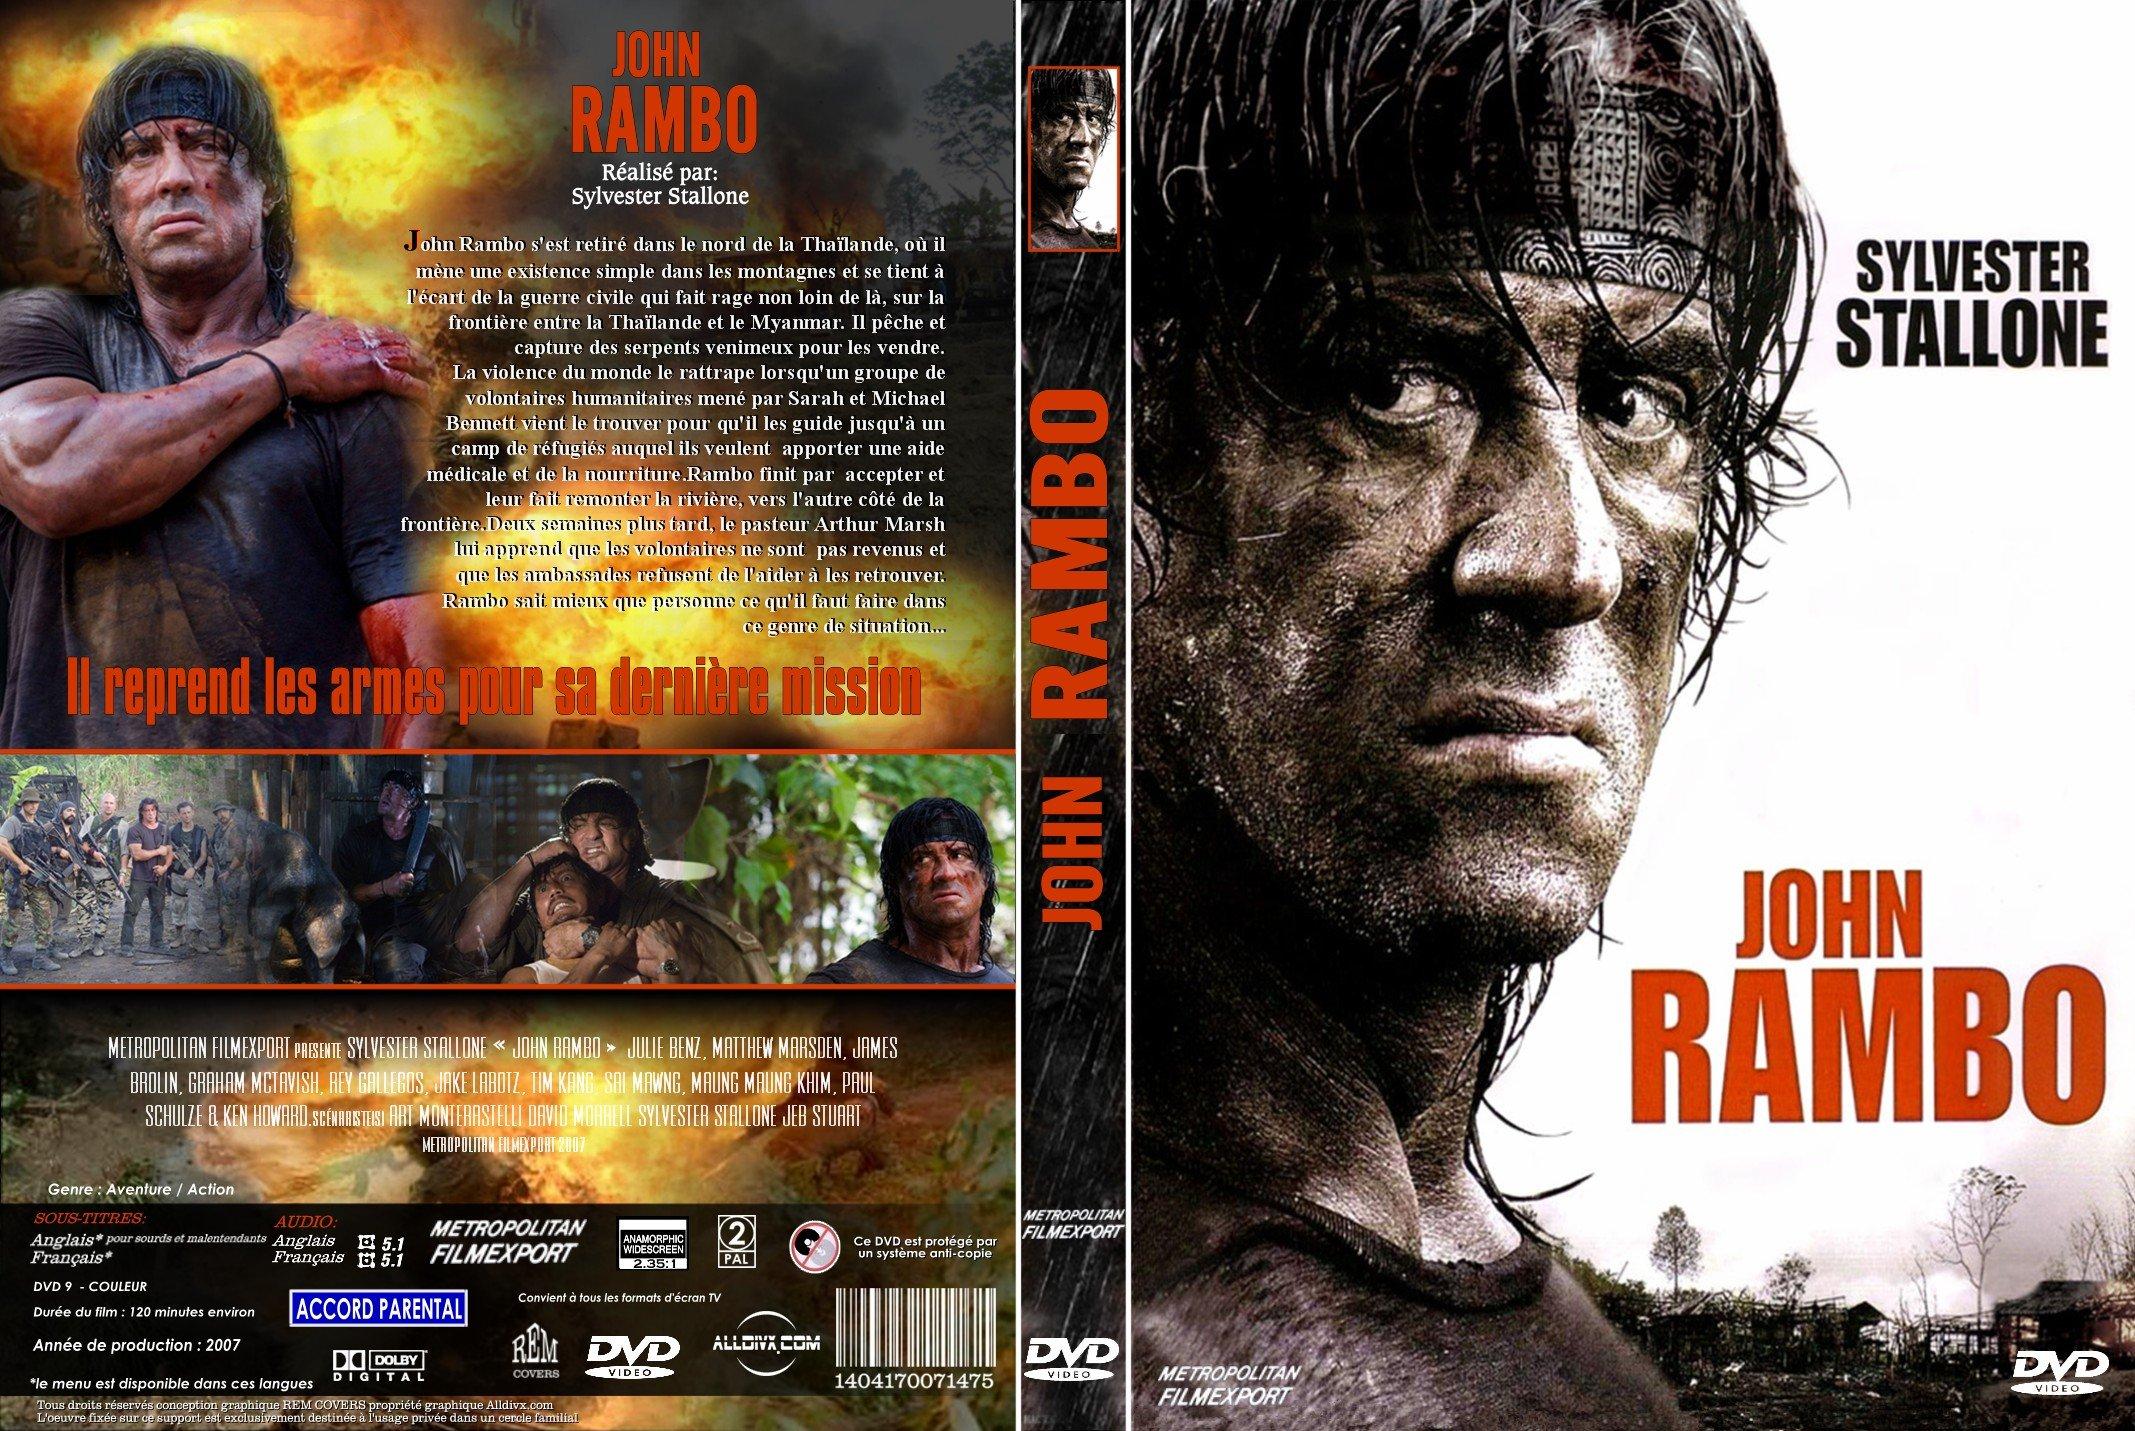 Rambo 5 dvd / Imdb party down south